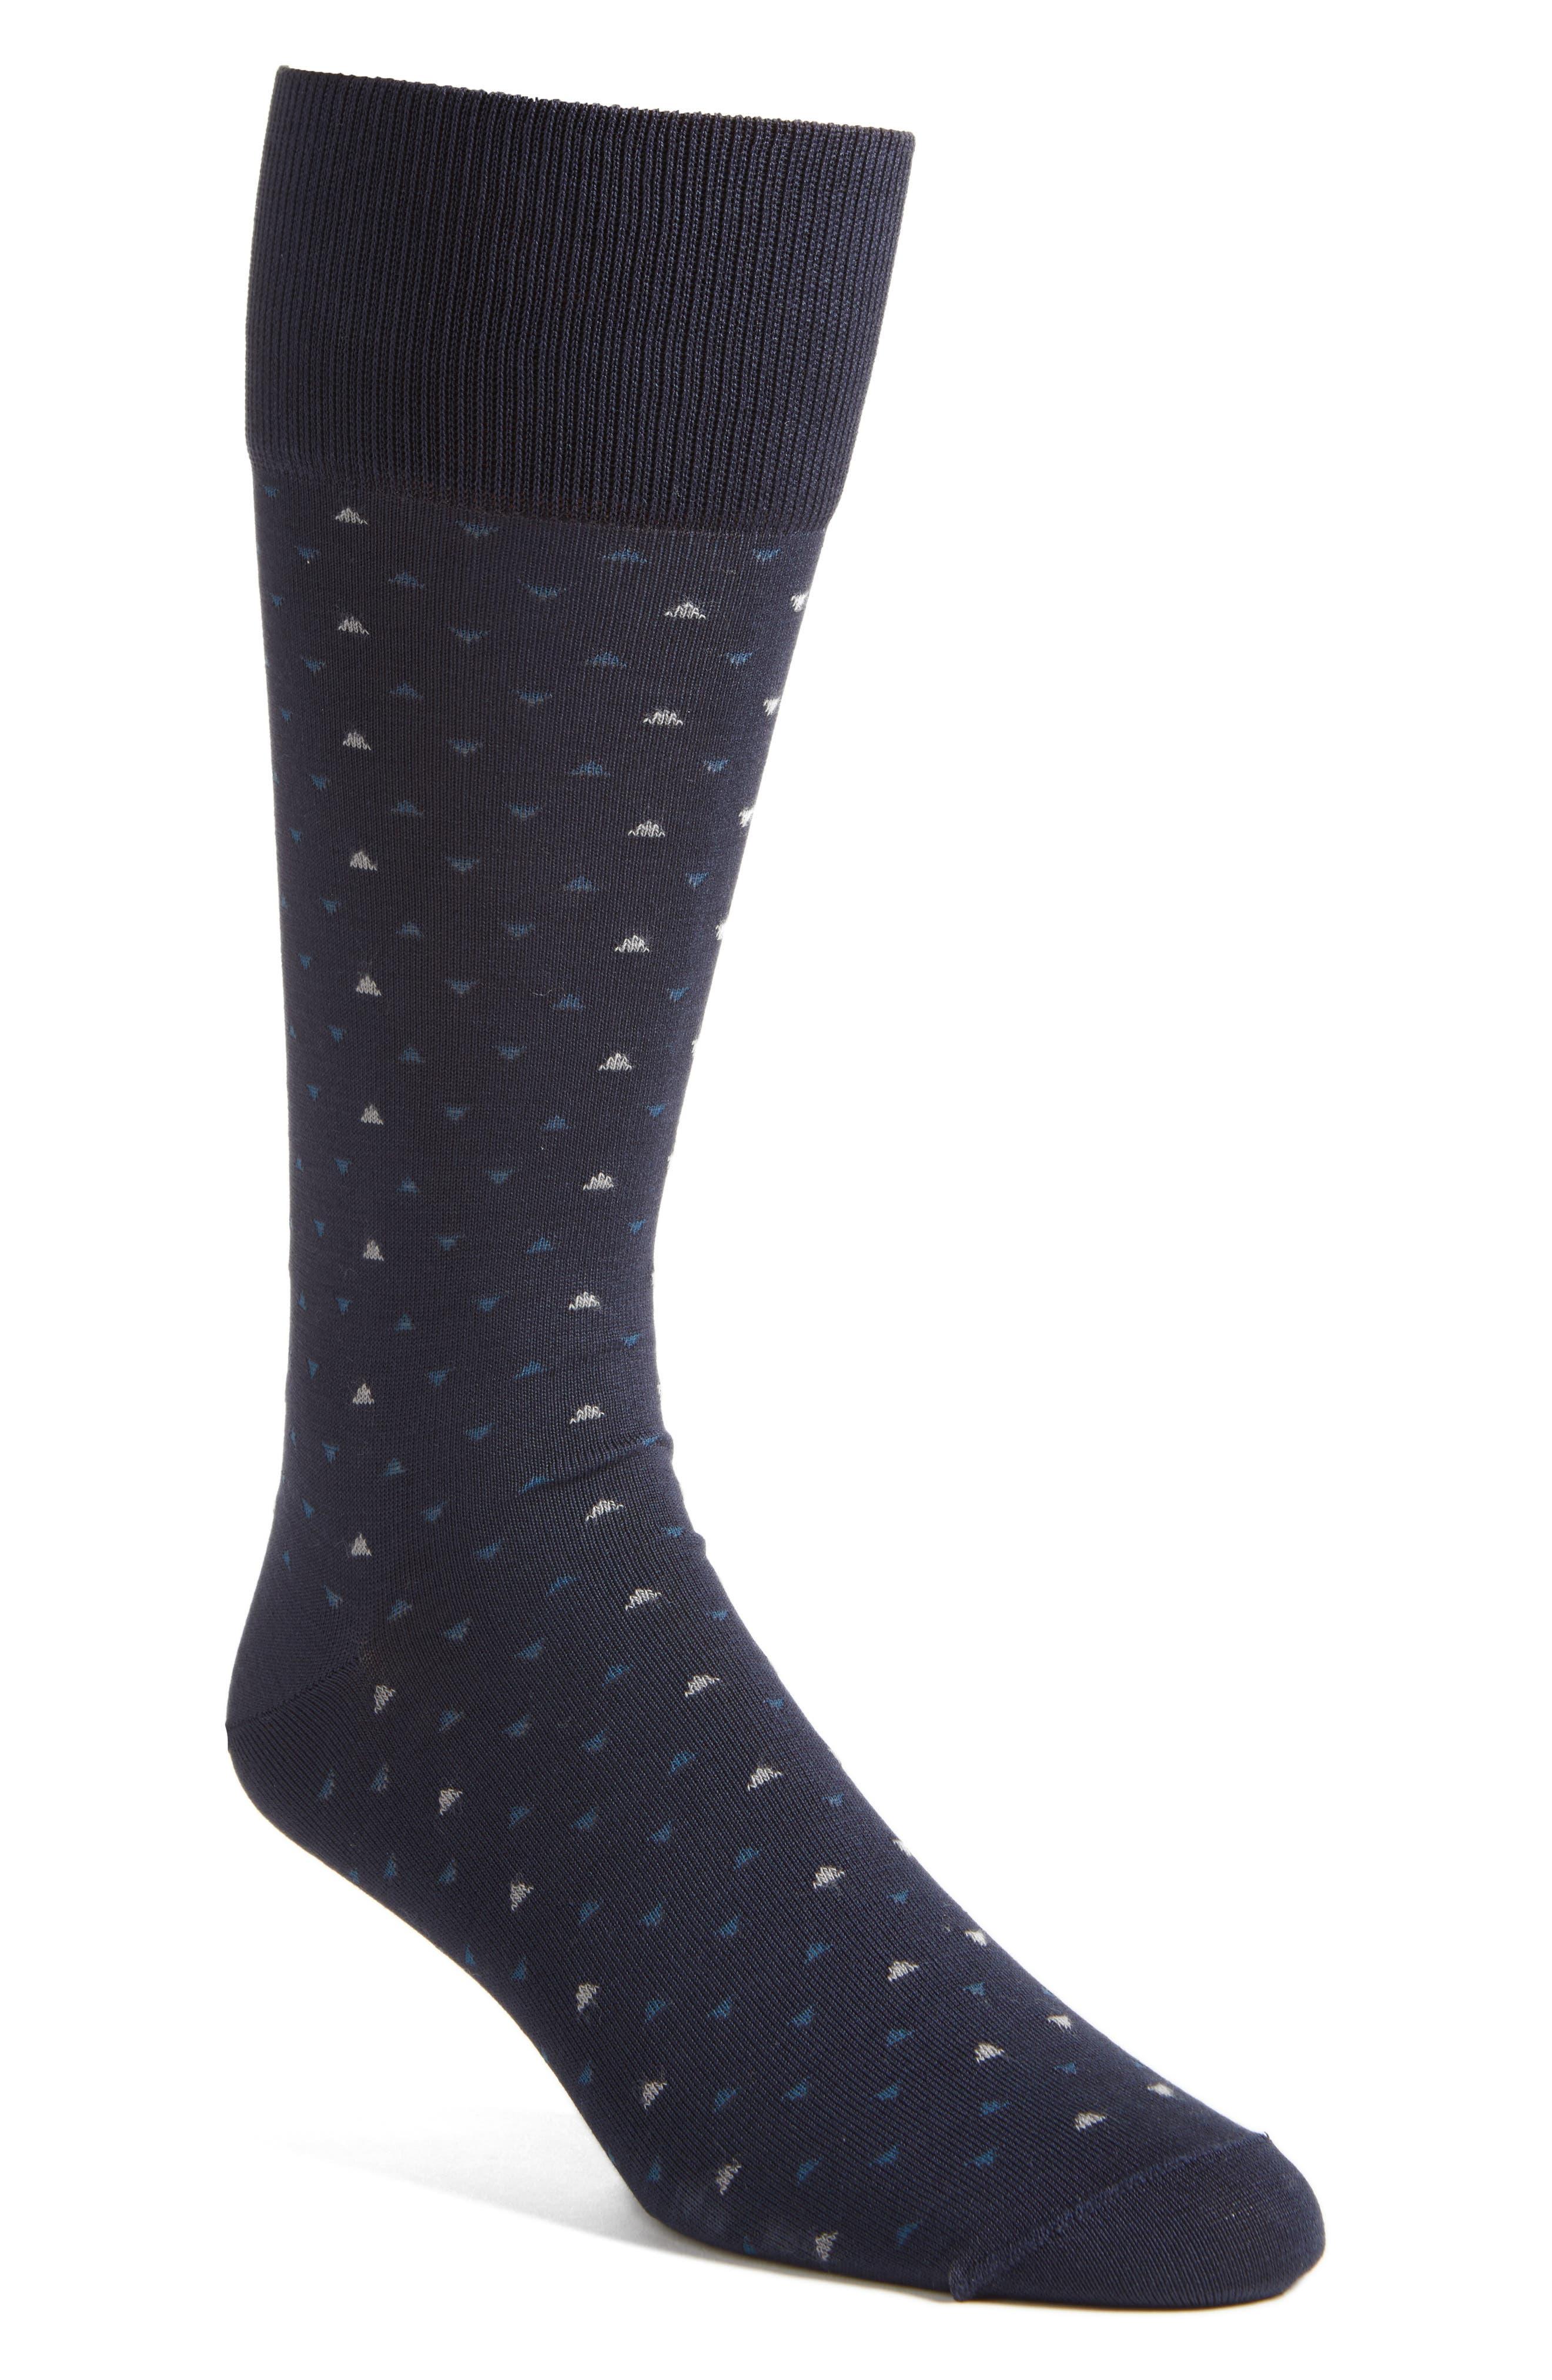 Geometric Socks,                             Main thumbnail 1, color,                             Navy/ Taupe